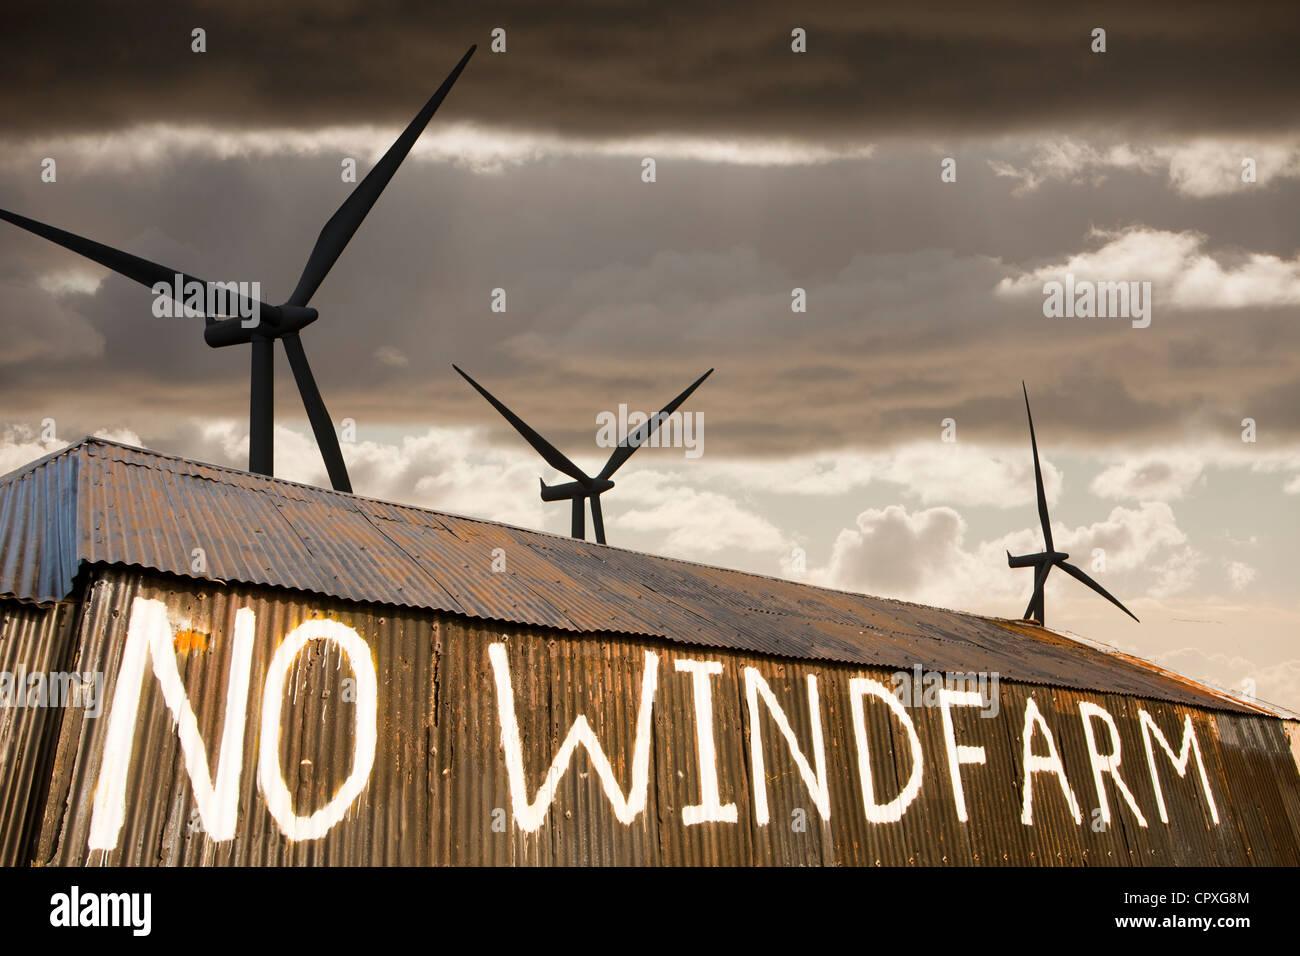 composite of a wind farm and an anti wind farm protest on a barn outside Carlisle, Cumbria, UK. - Stock Image